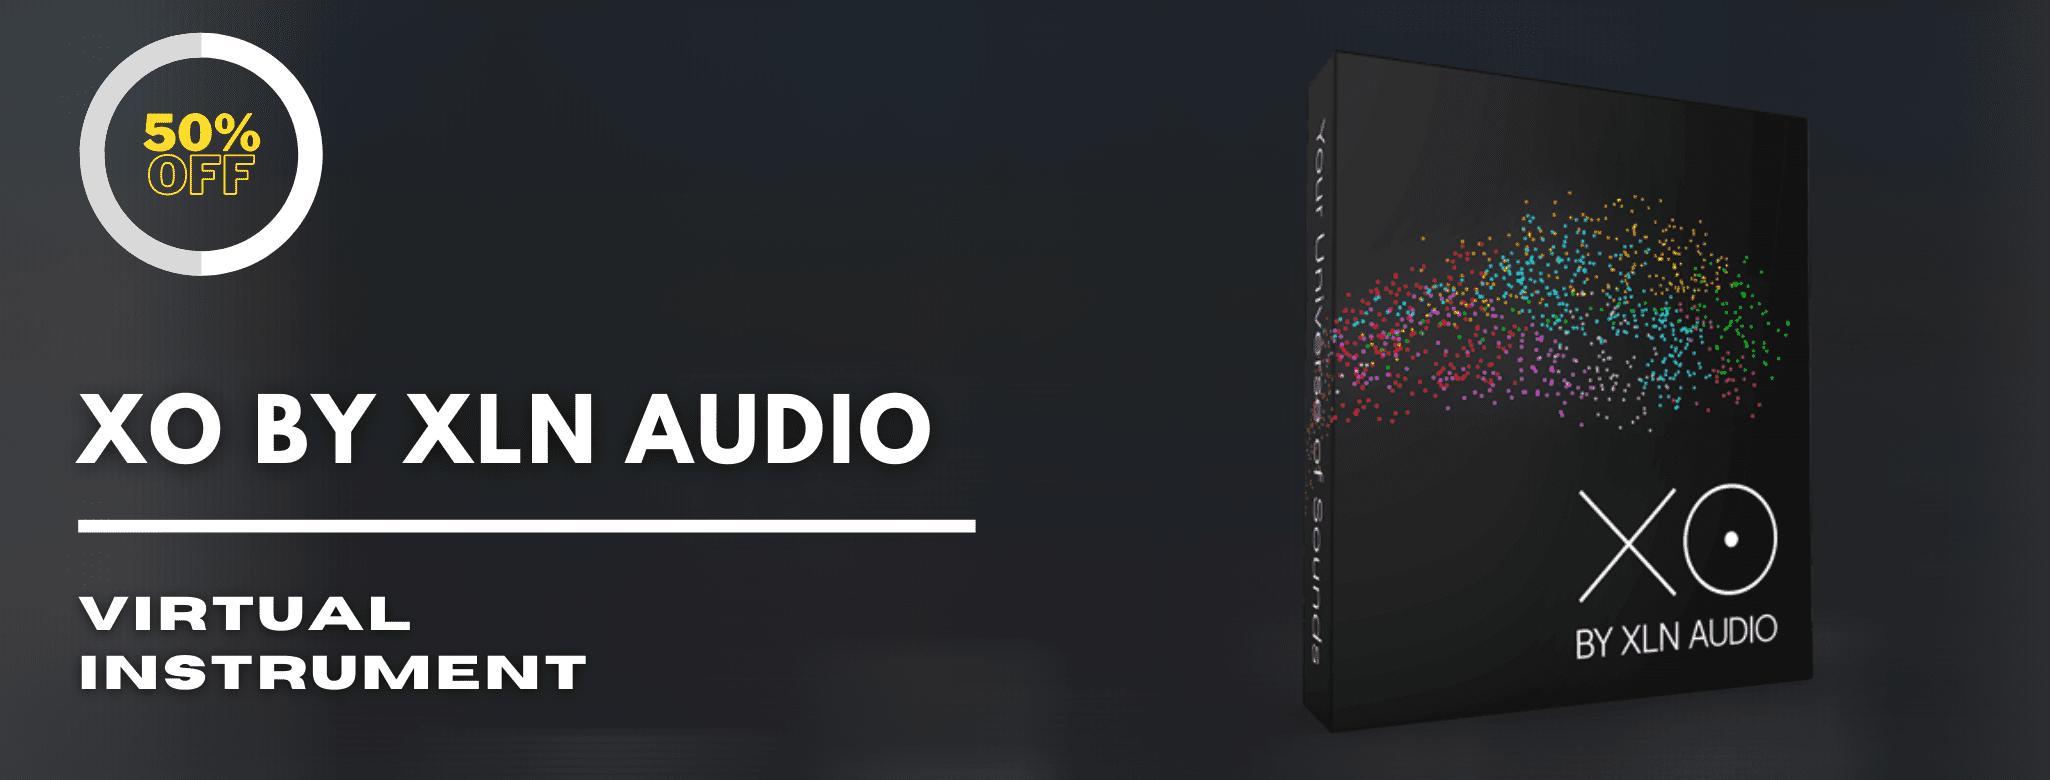 xo by xln audio